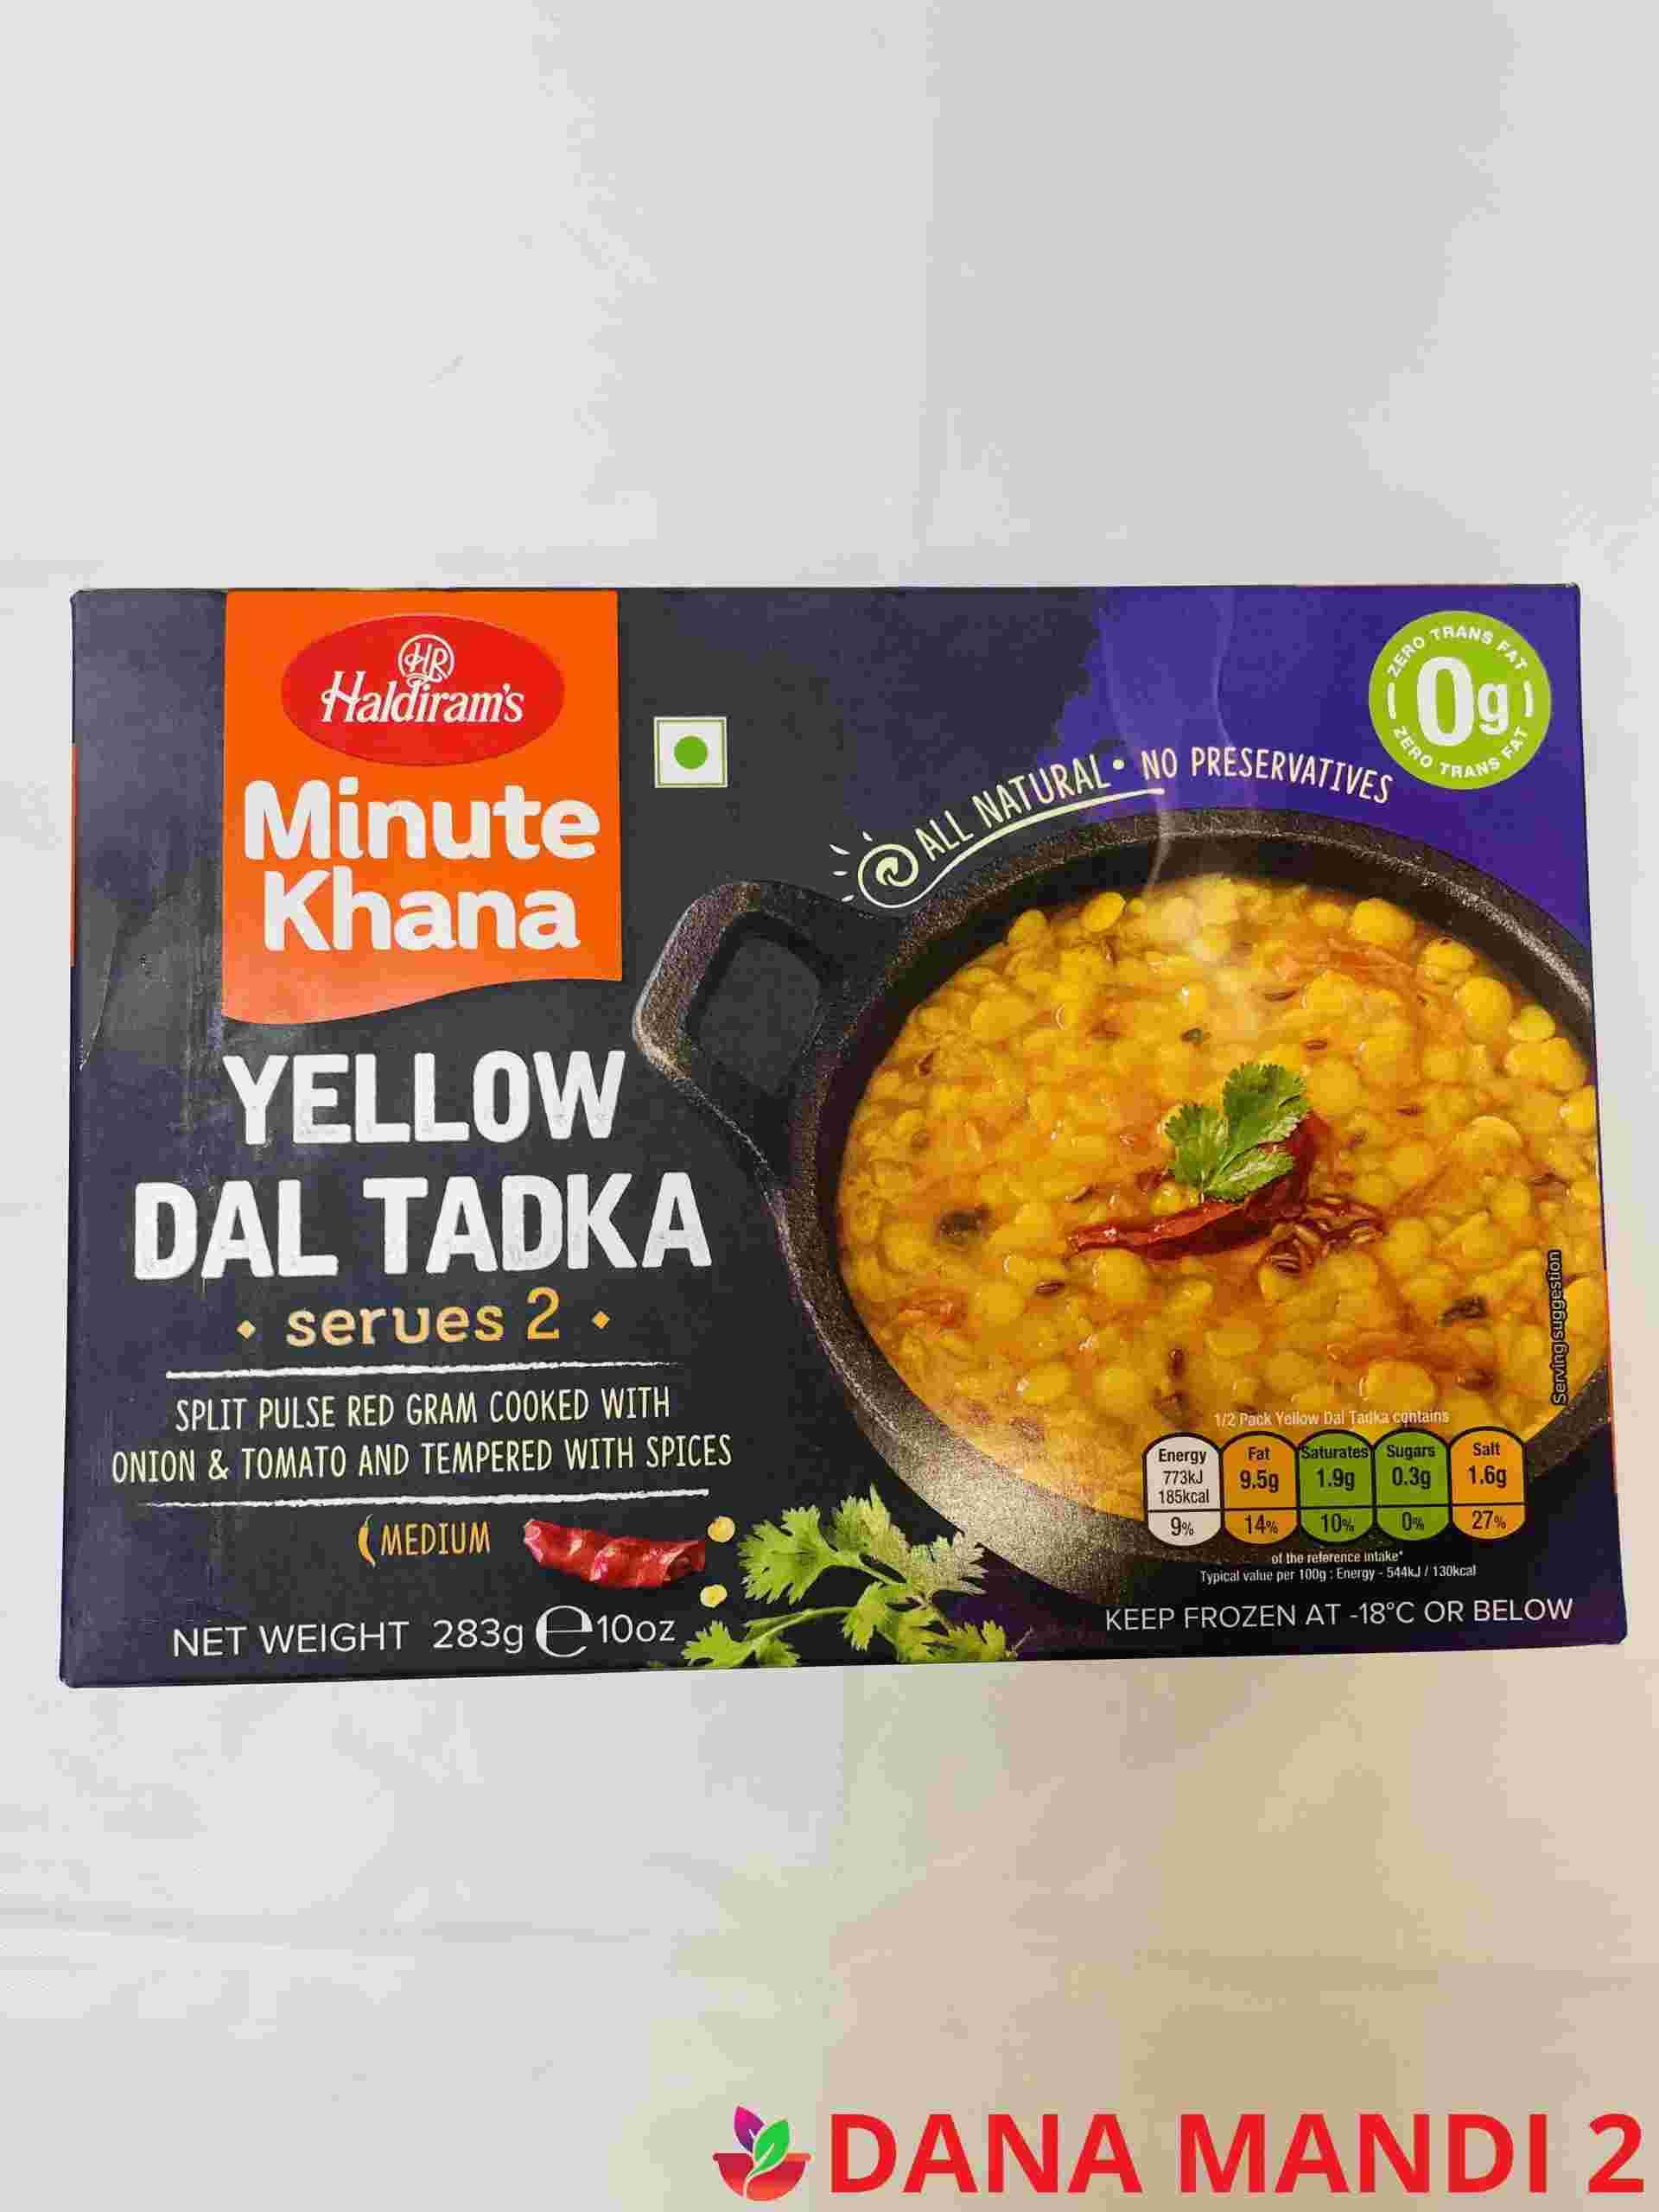 Haldiram's Yellow Dal Tadka